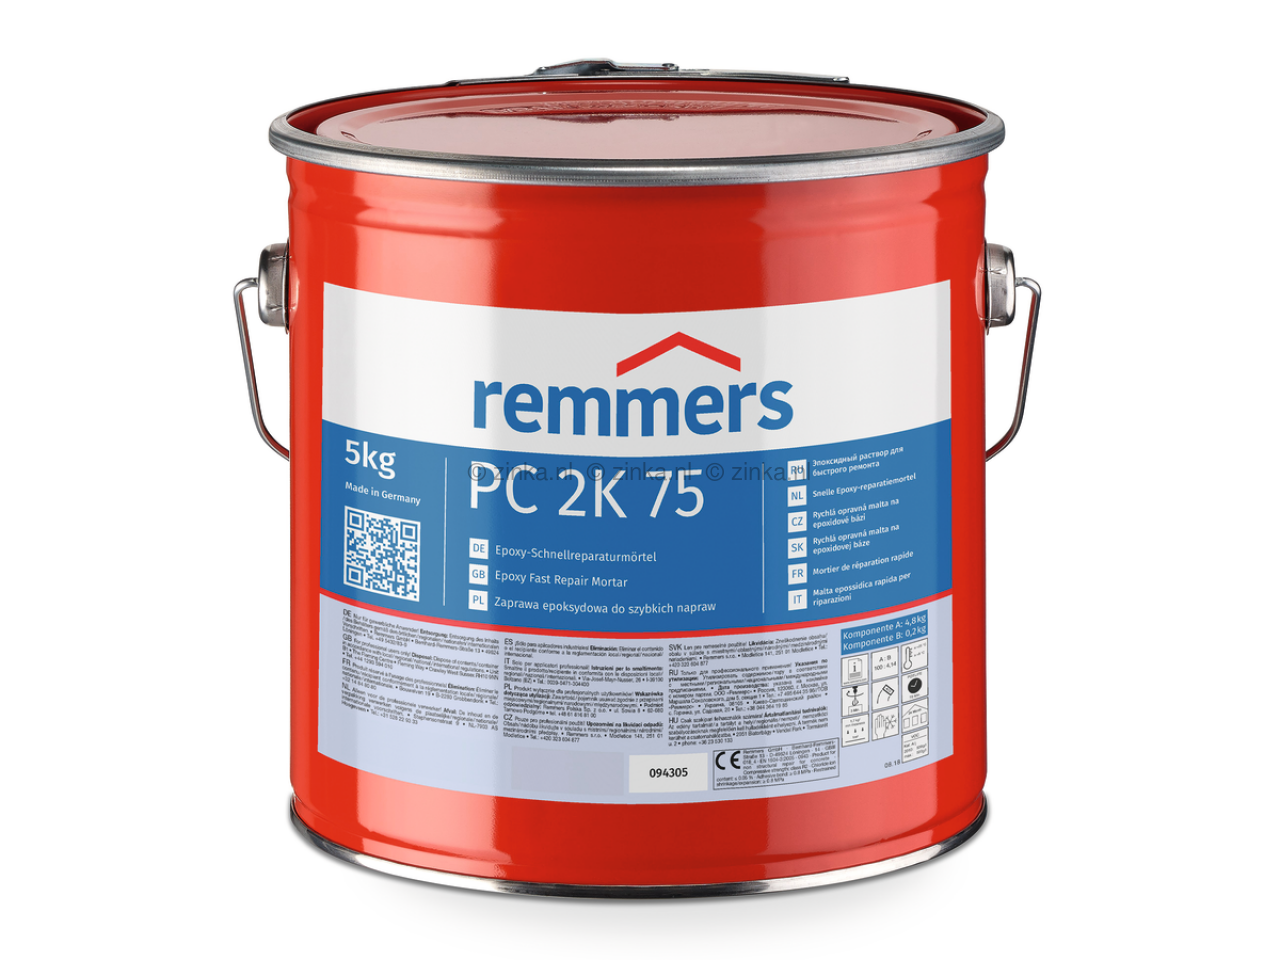 Remmers PC 2K 75 : Snelle, epoxy reparatiemortel | Remmers